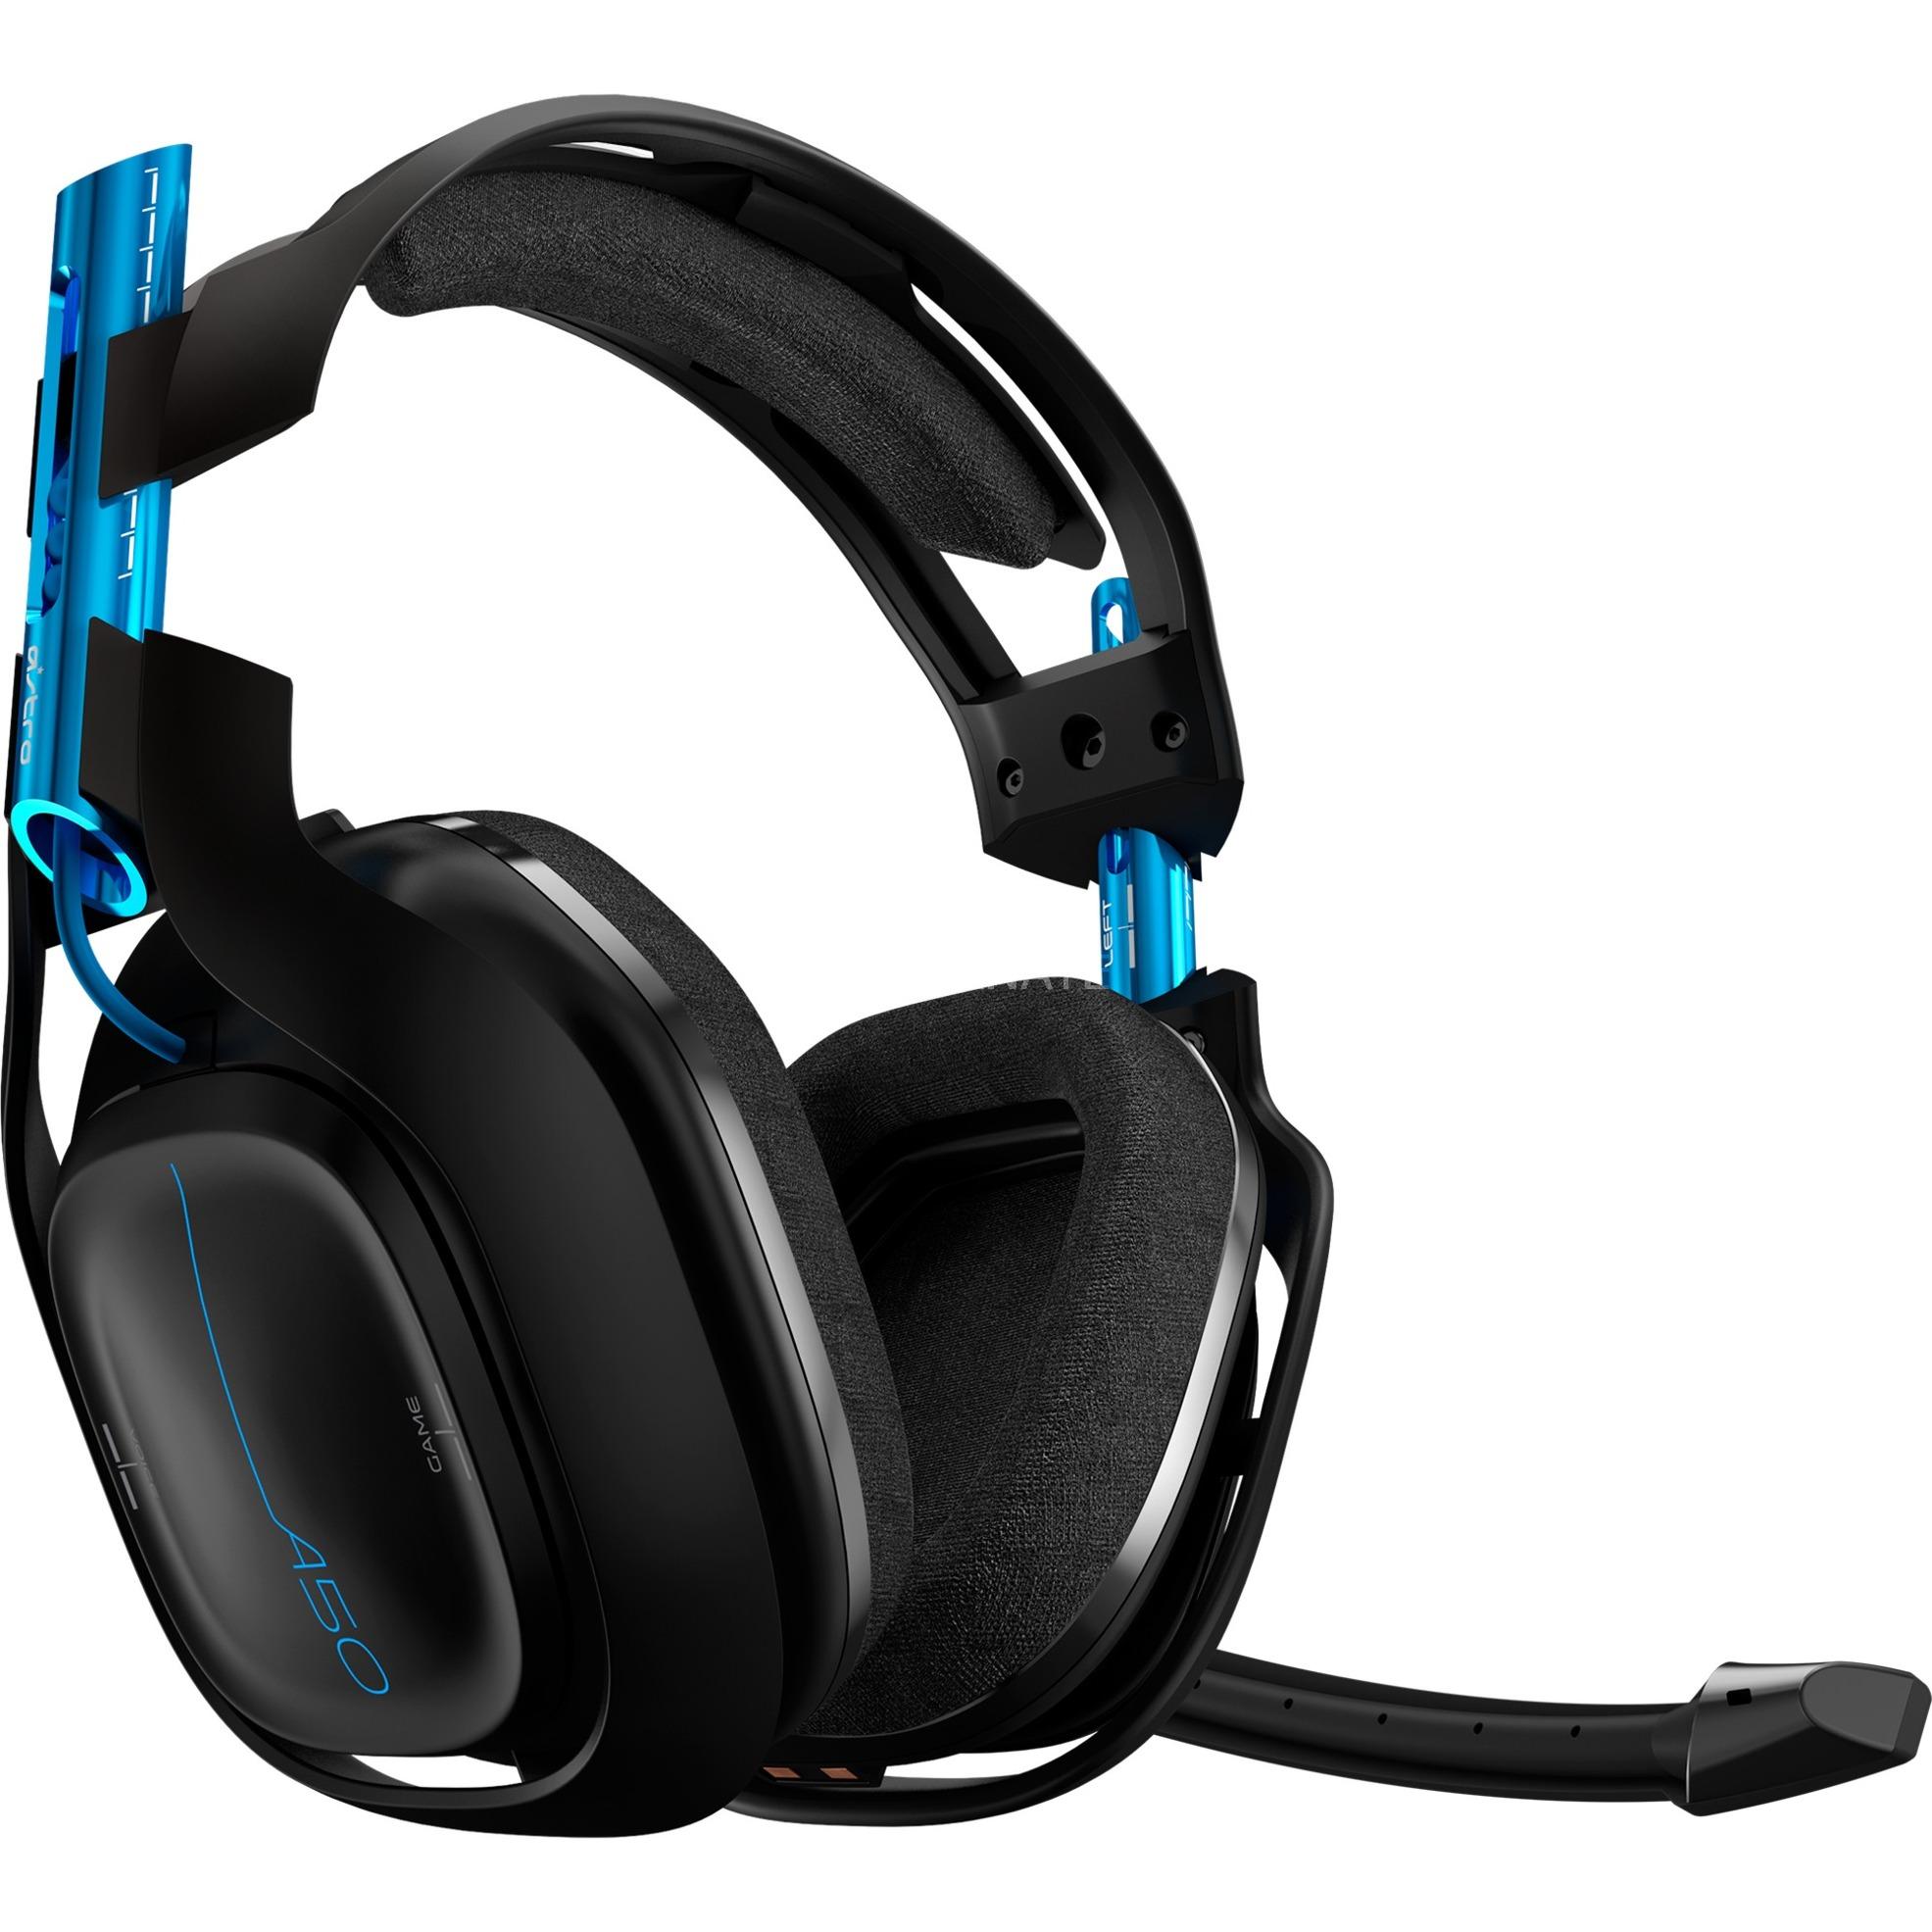 A50 Wireless Headset + Base Station Binaural Bandeau Noir, Bleu Casque audio, Casque d'écoute